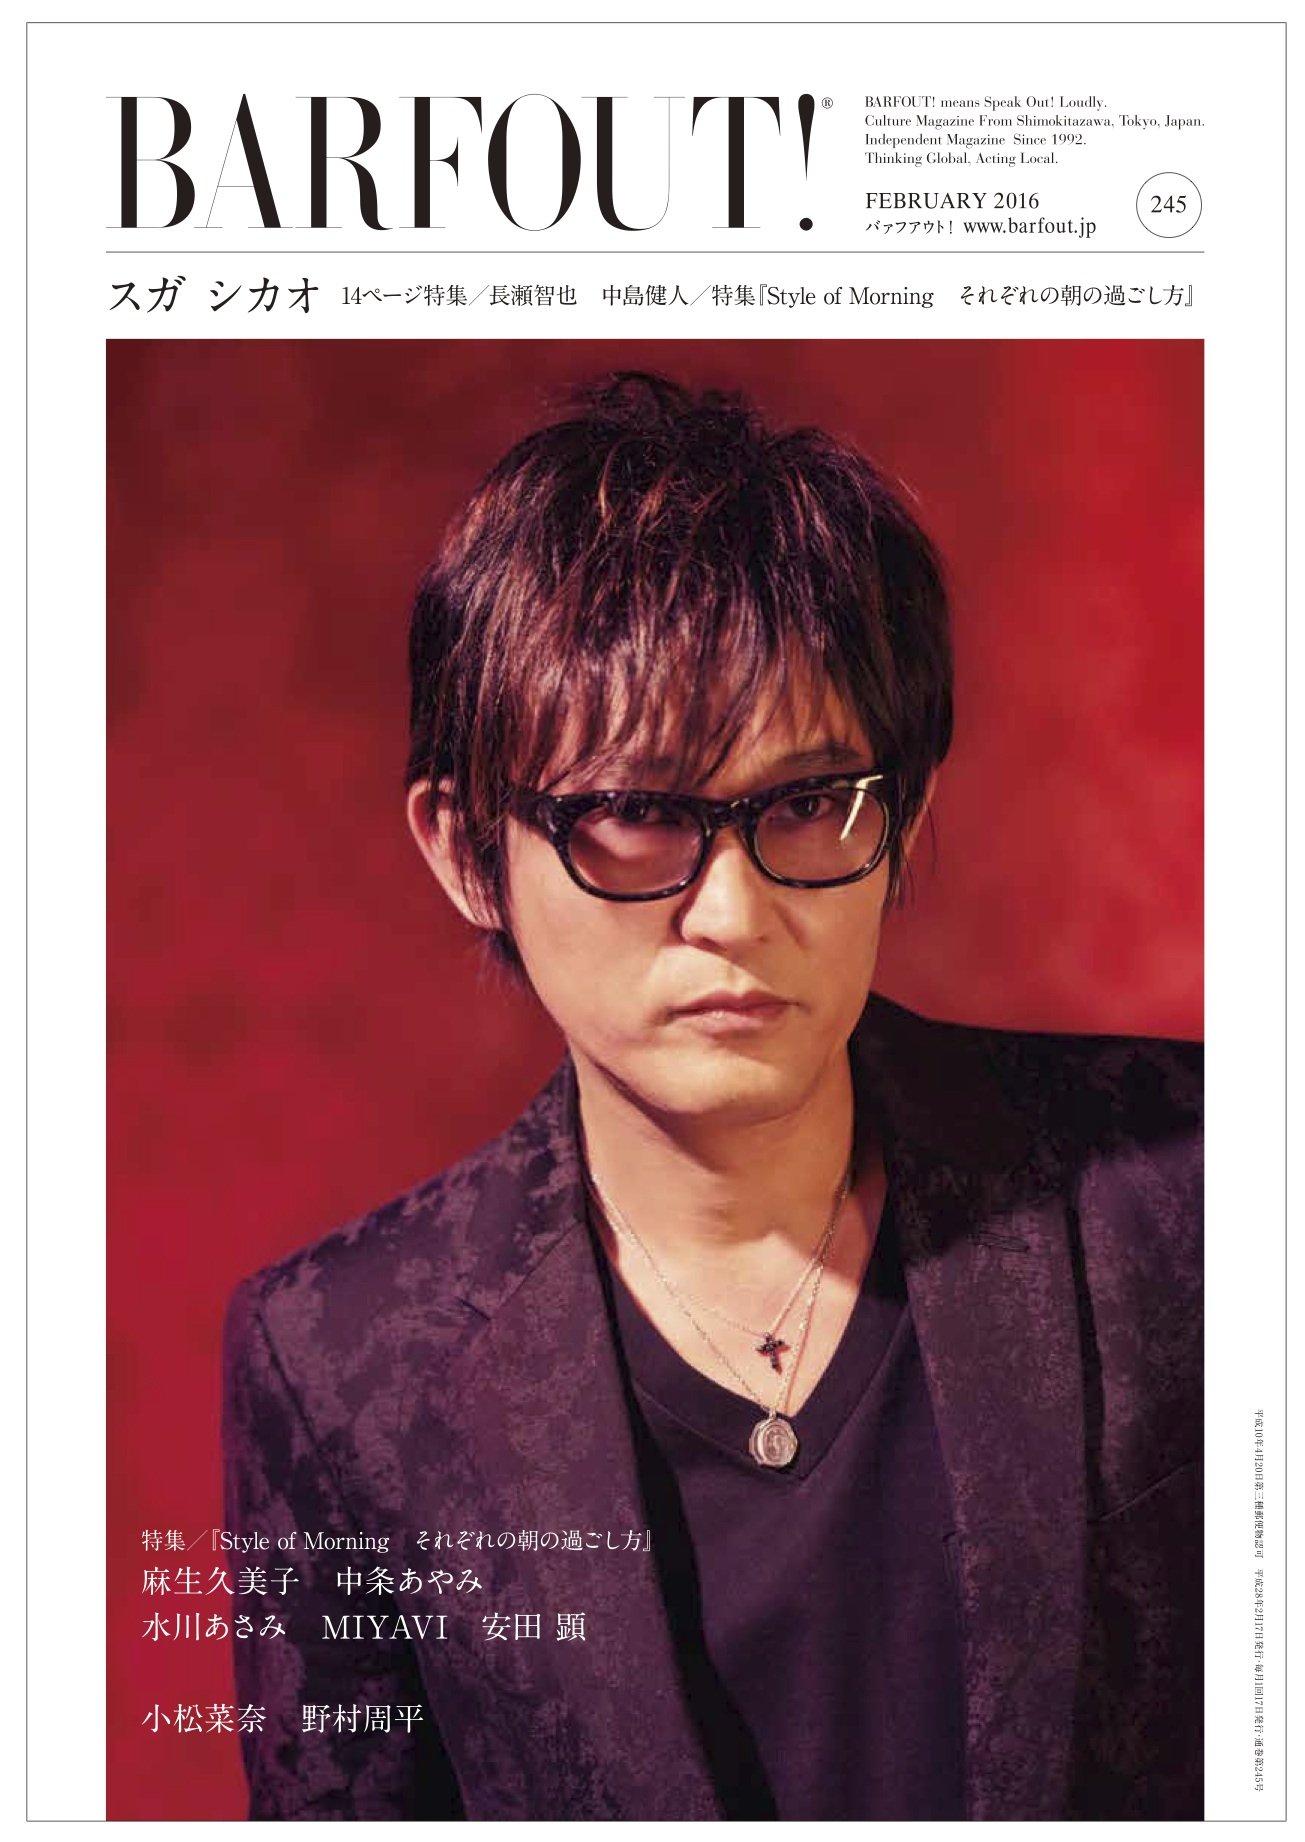 FEBRUARY 2016 VOLUME 245